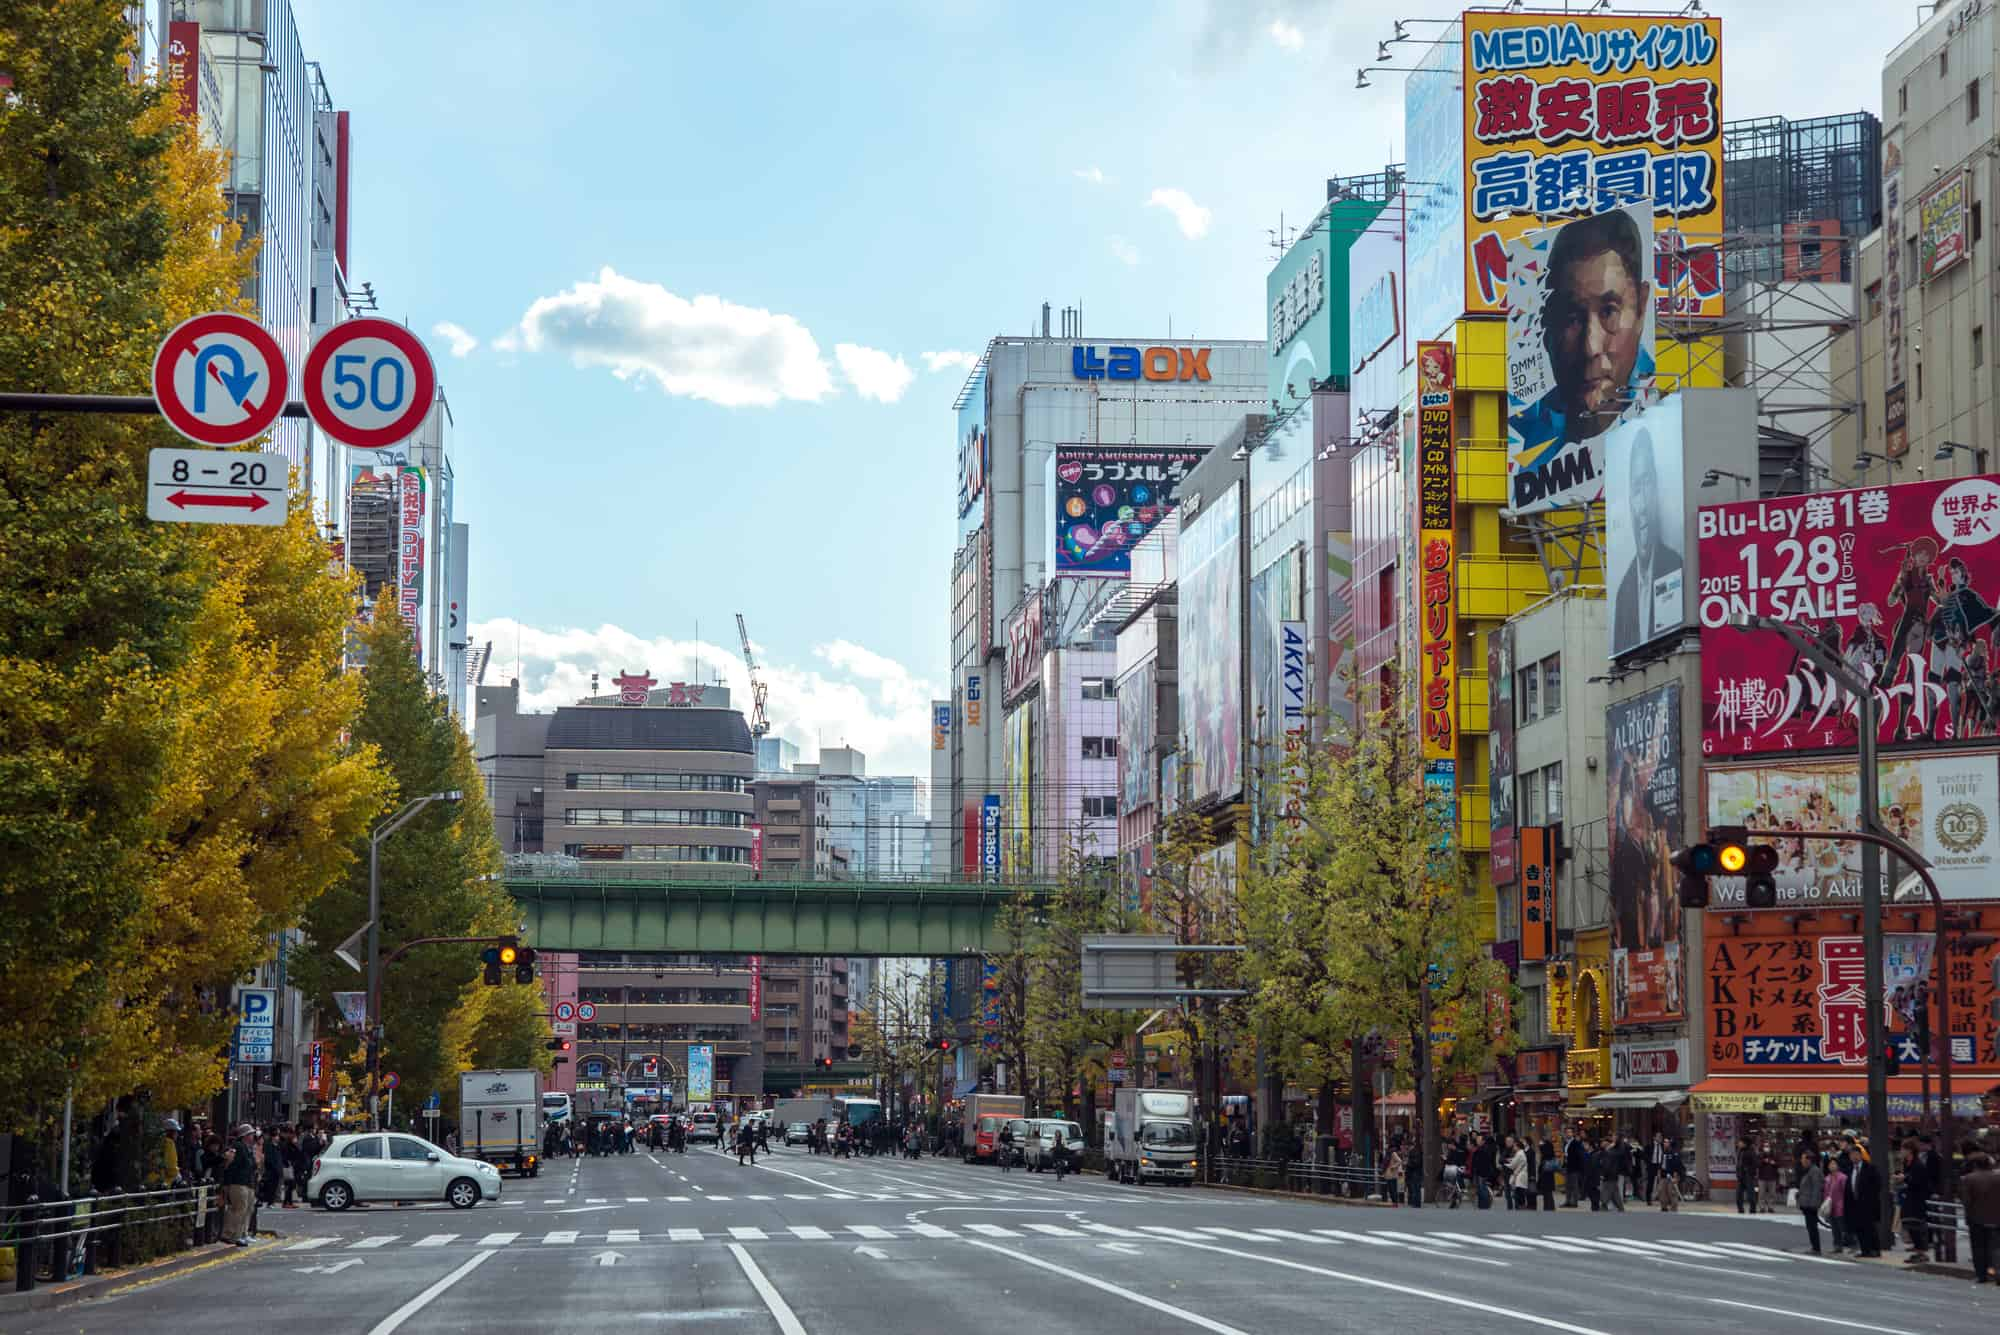 harajuku kvarteret i tokyo japan